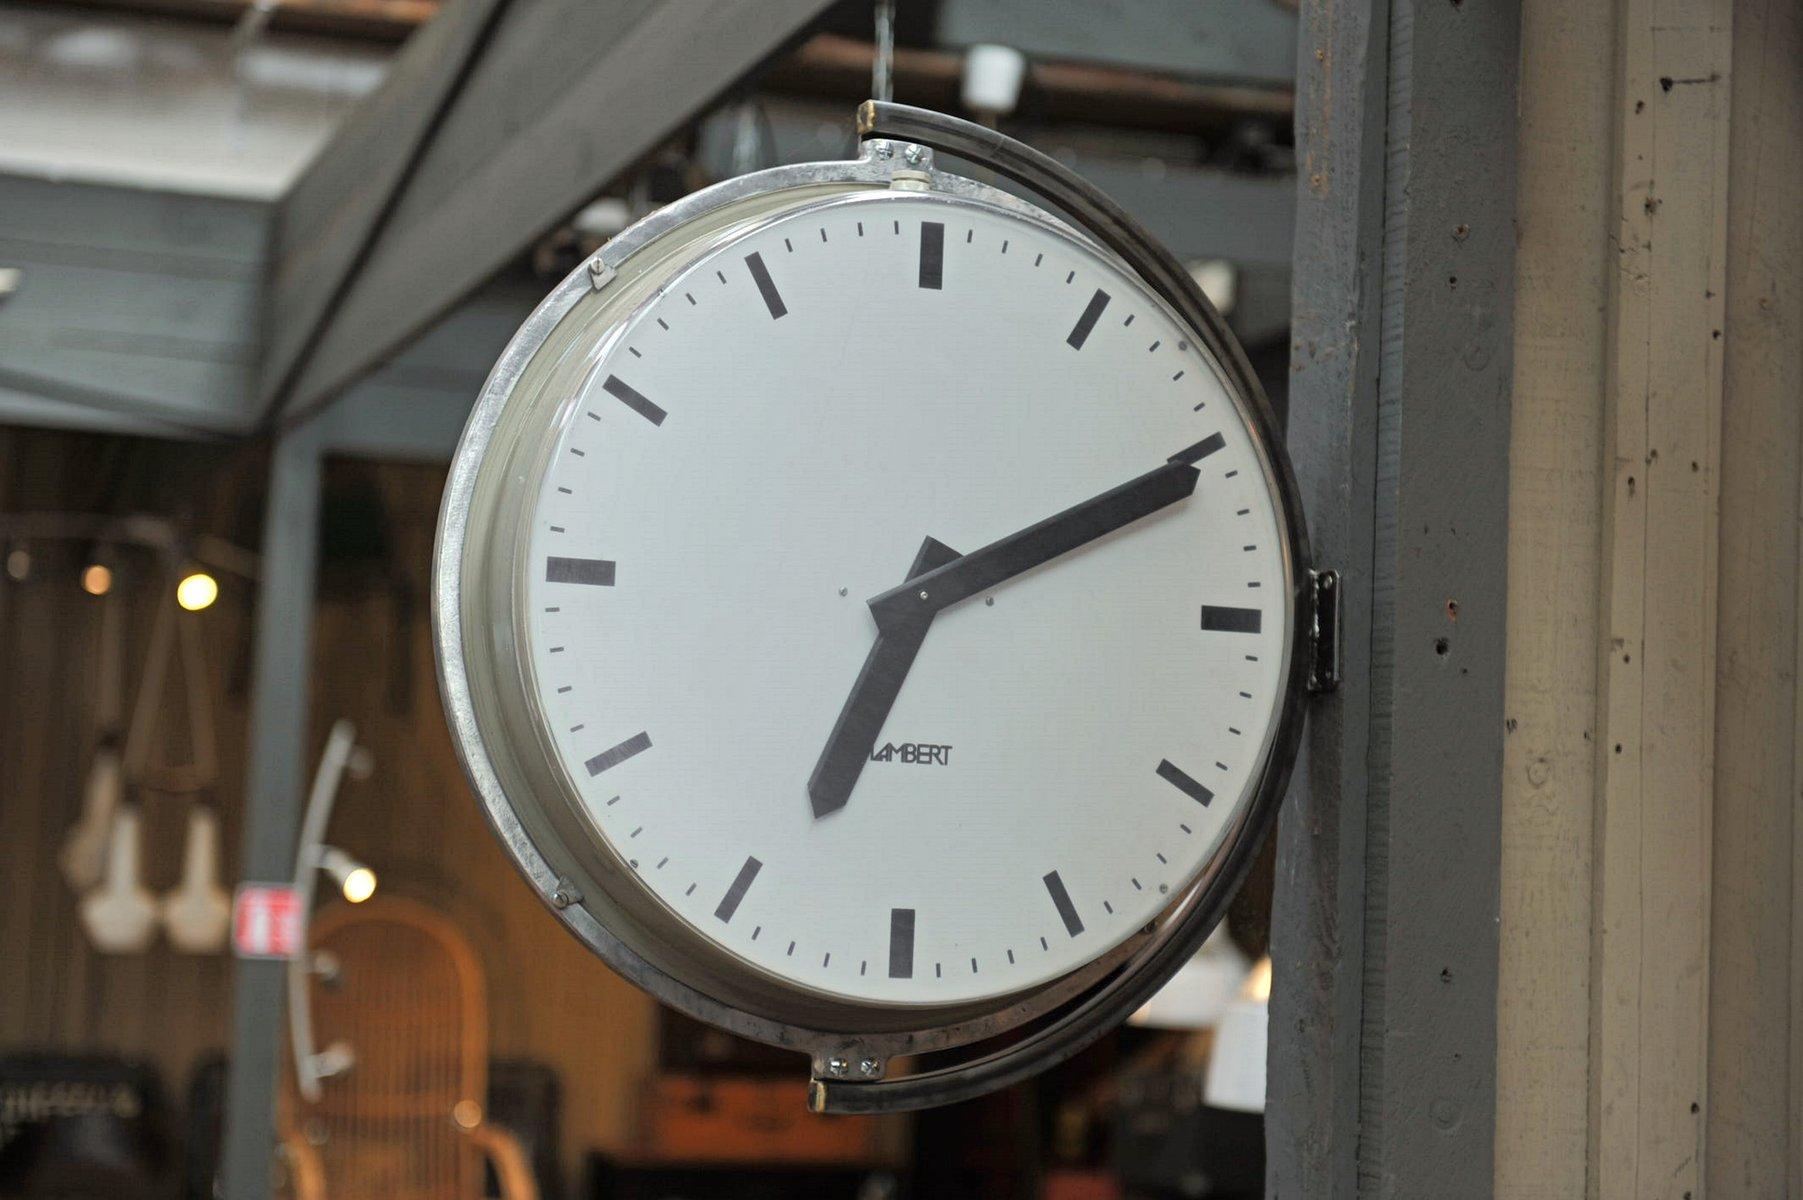 Grosse horloge murale design latest horloge getek d for Grosse pendule murale design